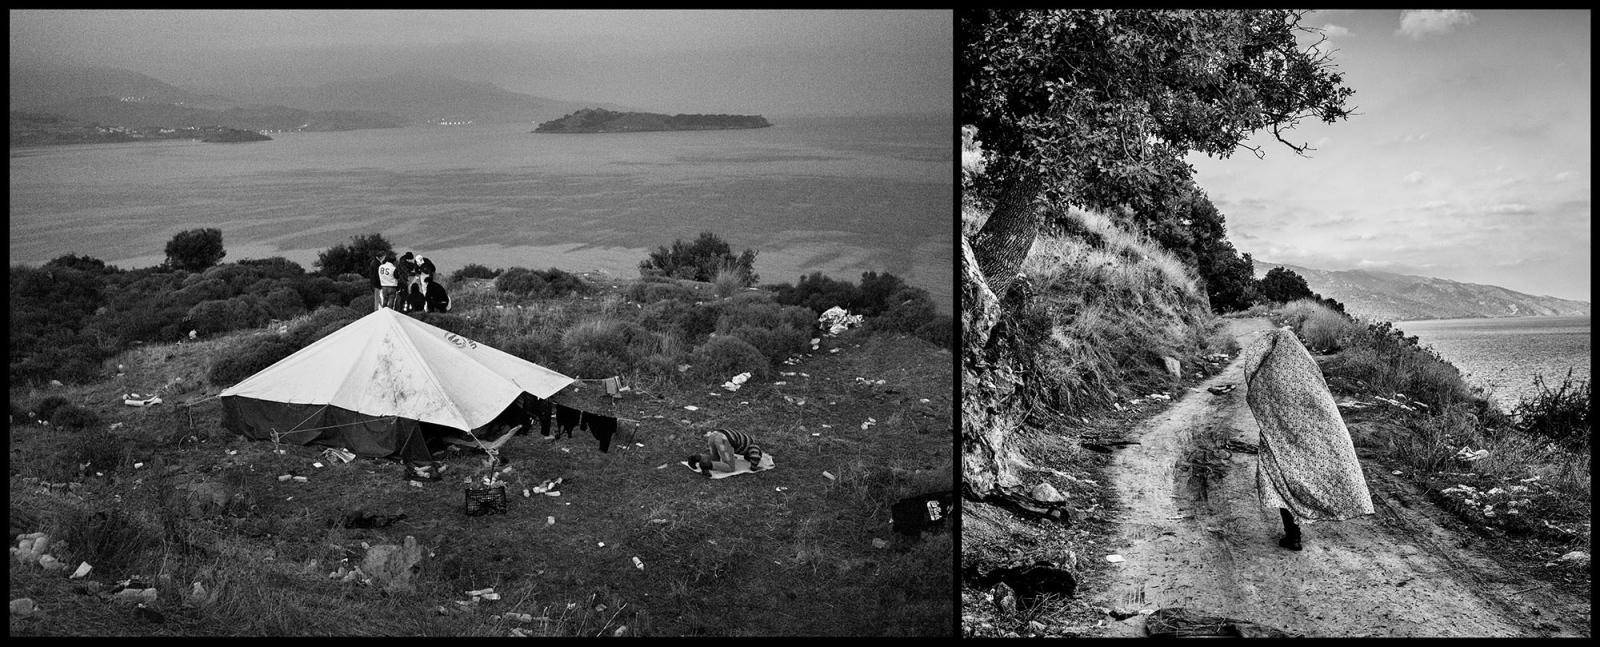 Art and Documentary Photography - Loading Nikos_Pilos_Stern_Goethe_institute_025.jpg